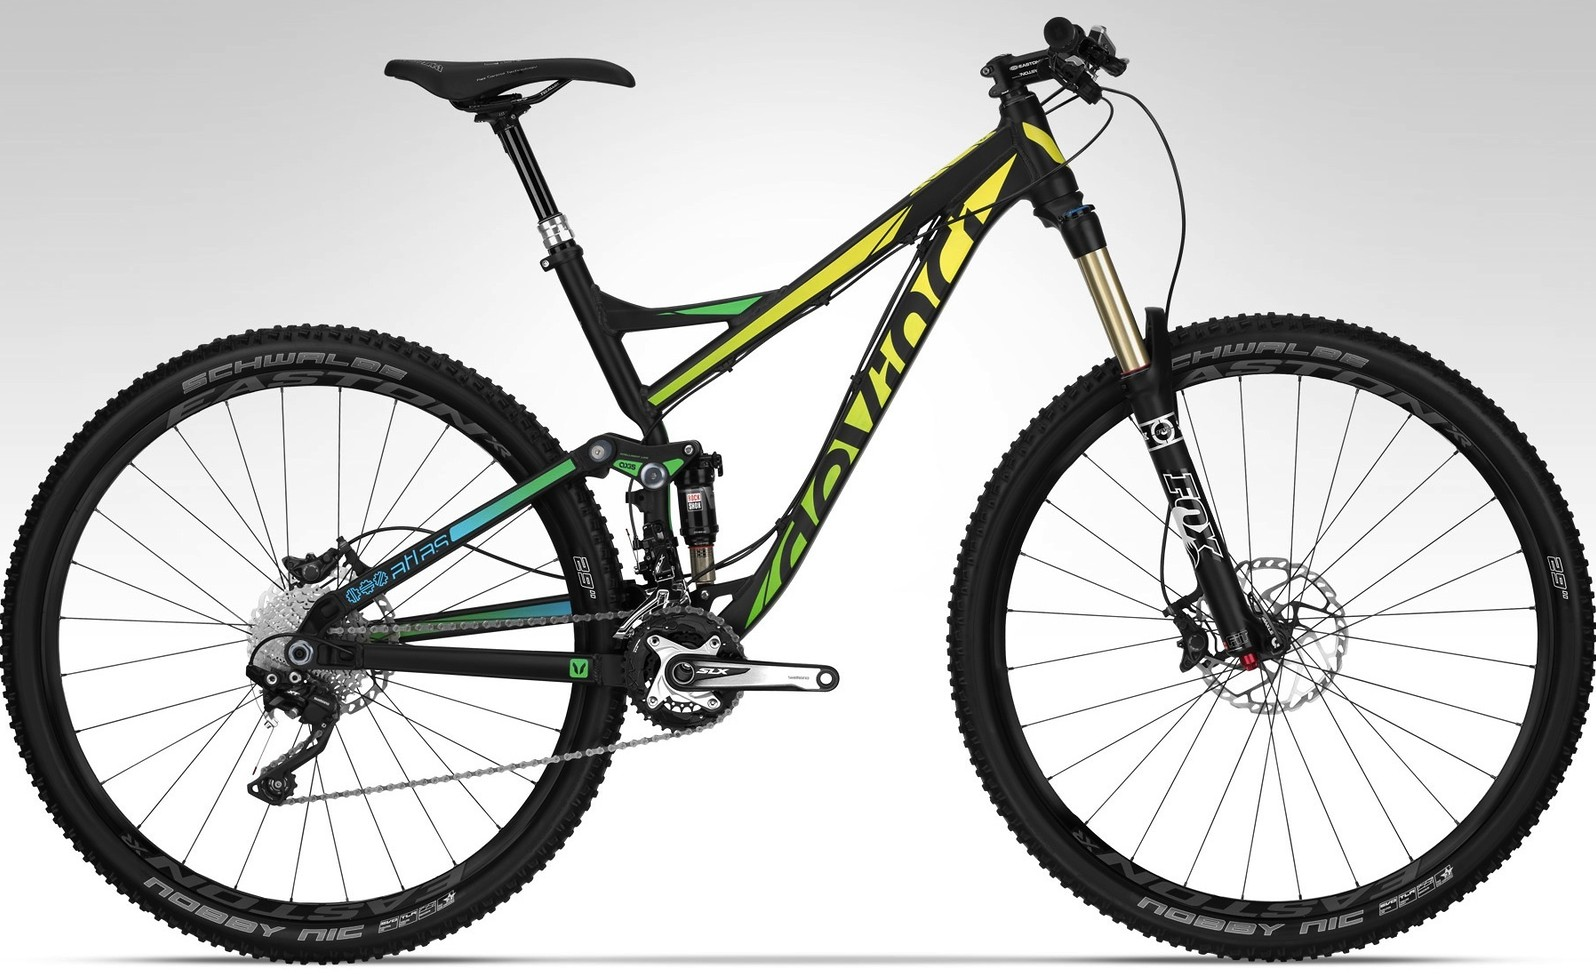 Devinci ATLAS RX bike